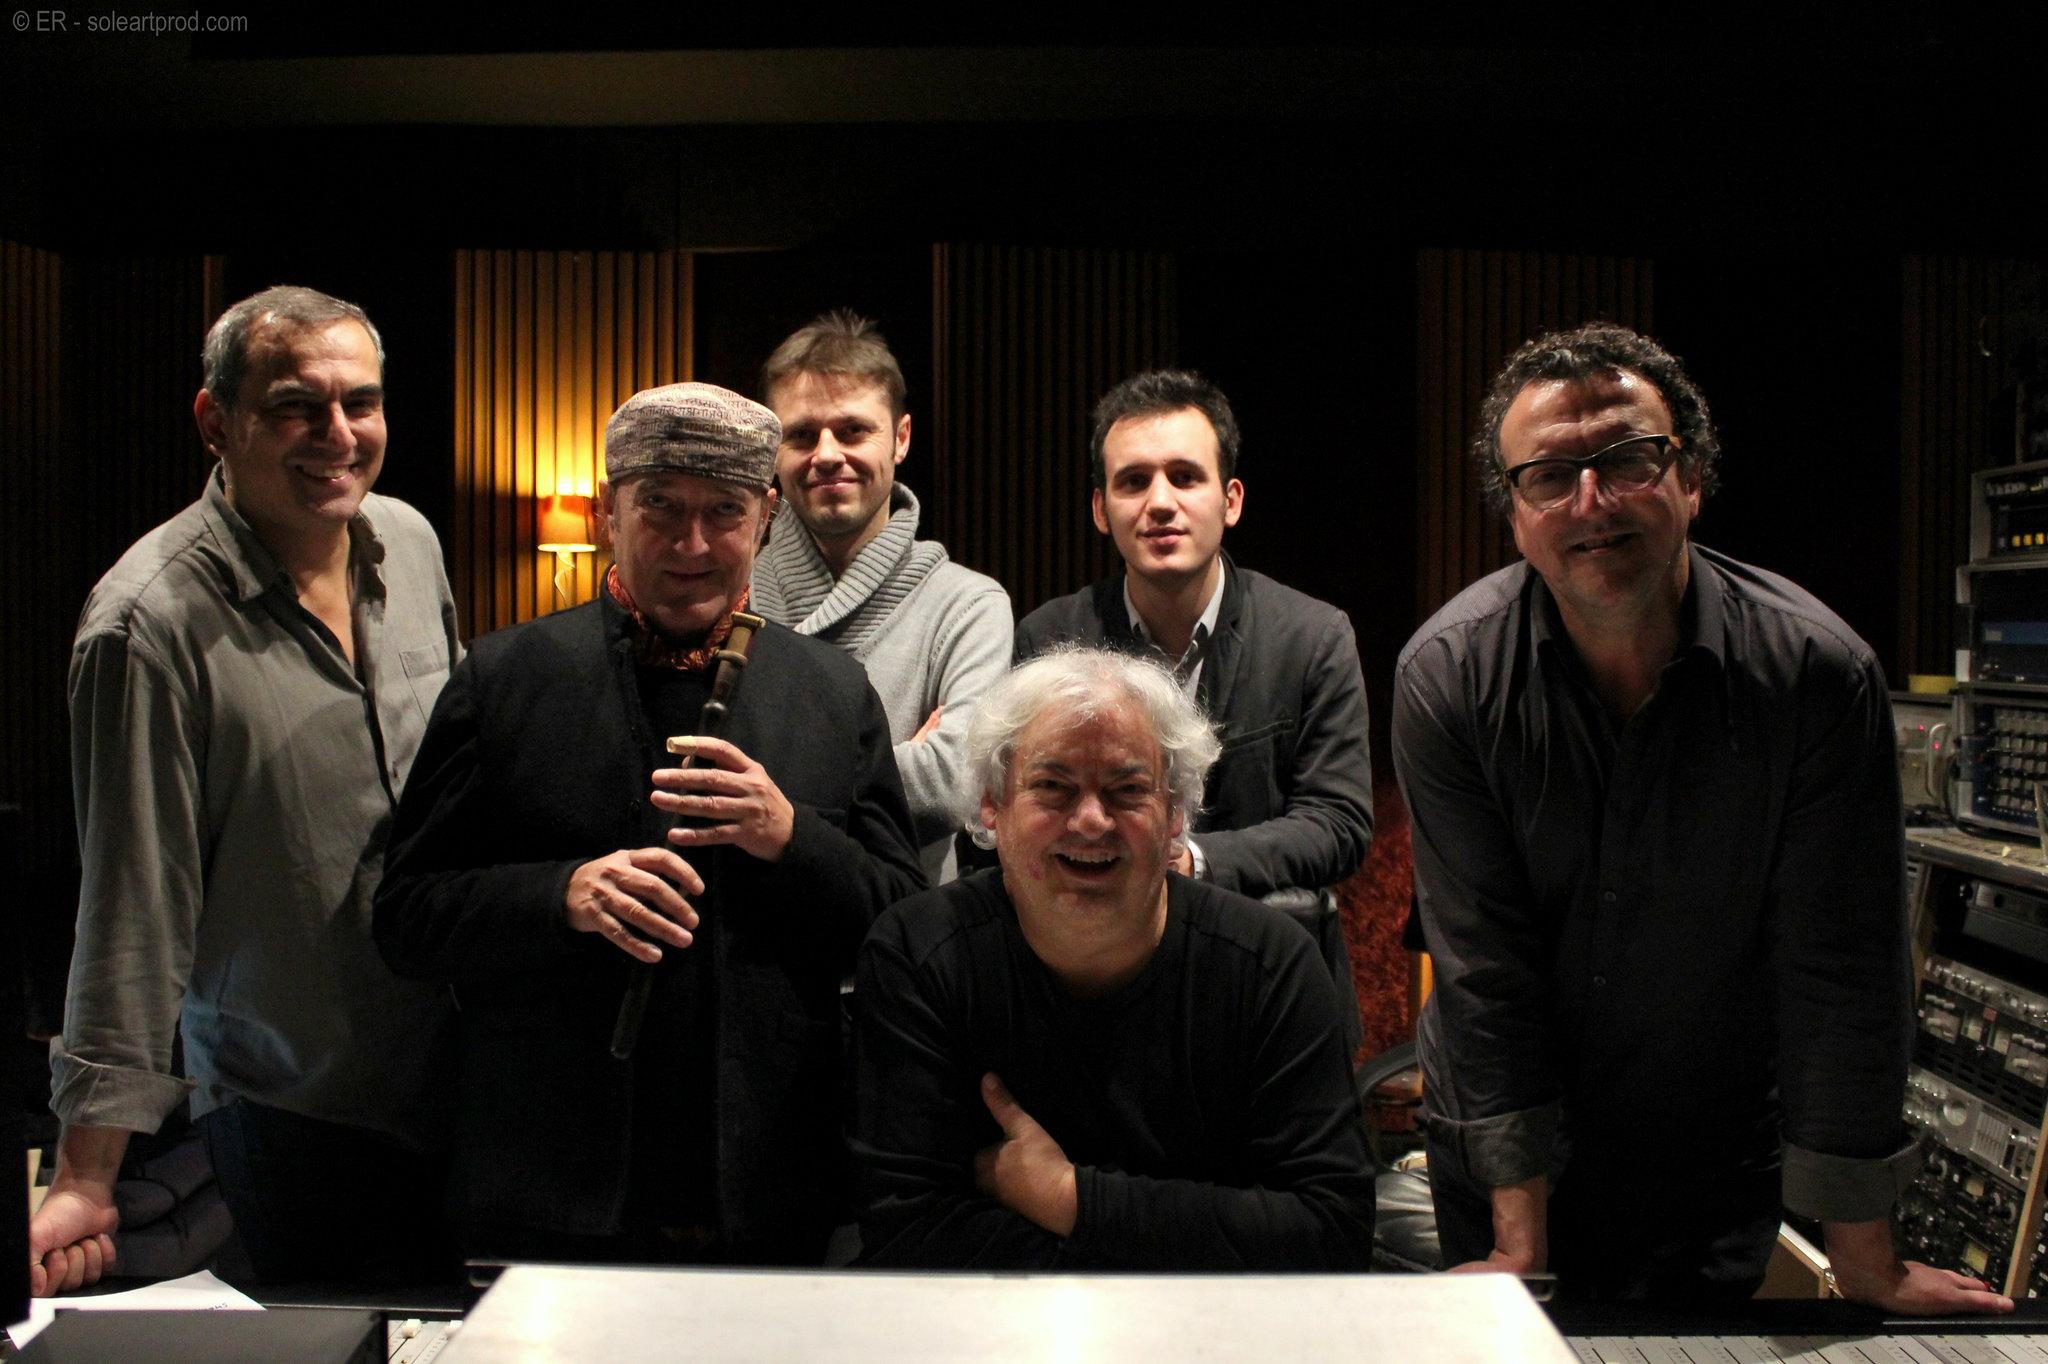 Studio Midi Live, enregistrement de l'album Motian in Motion